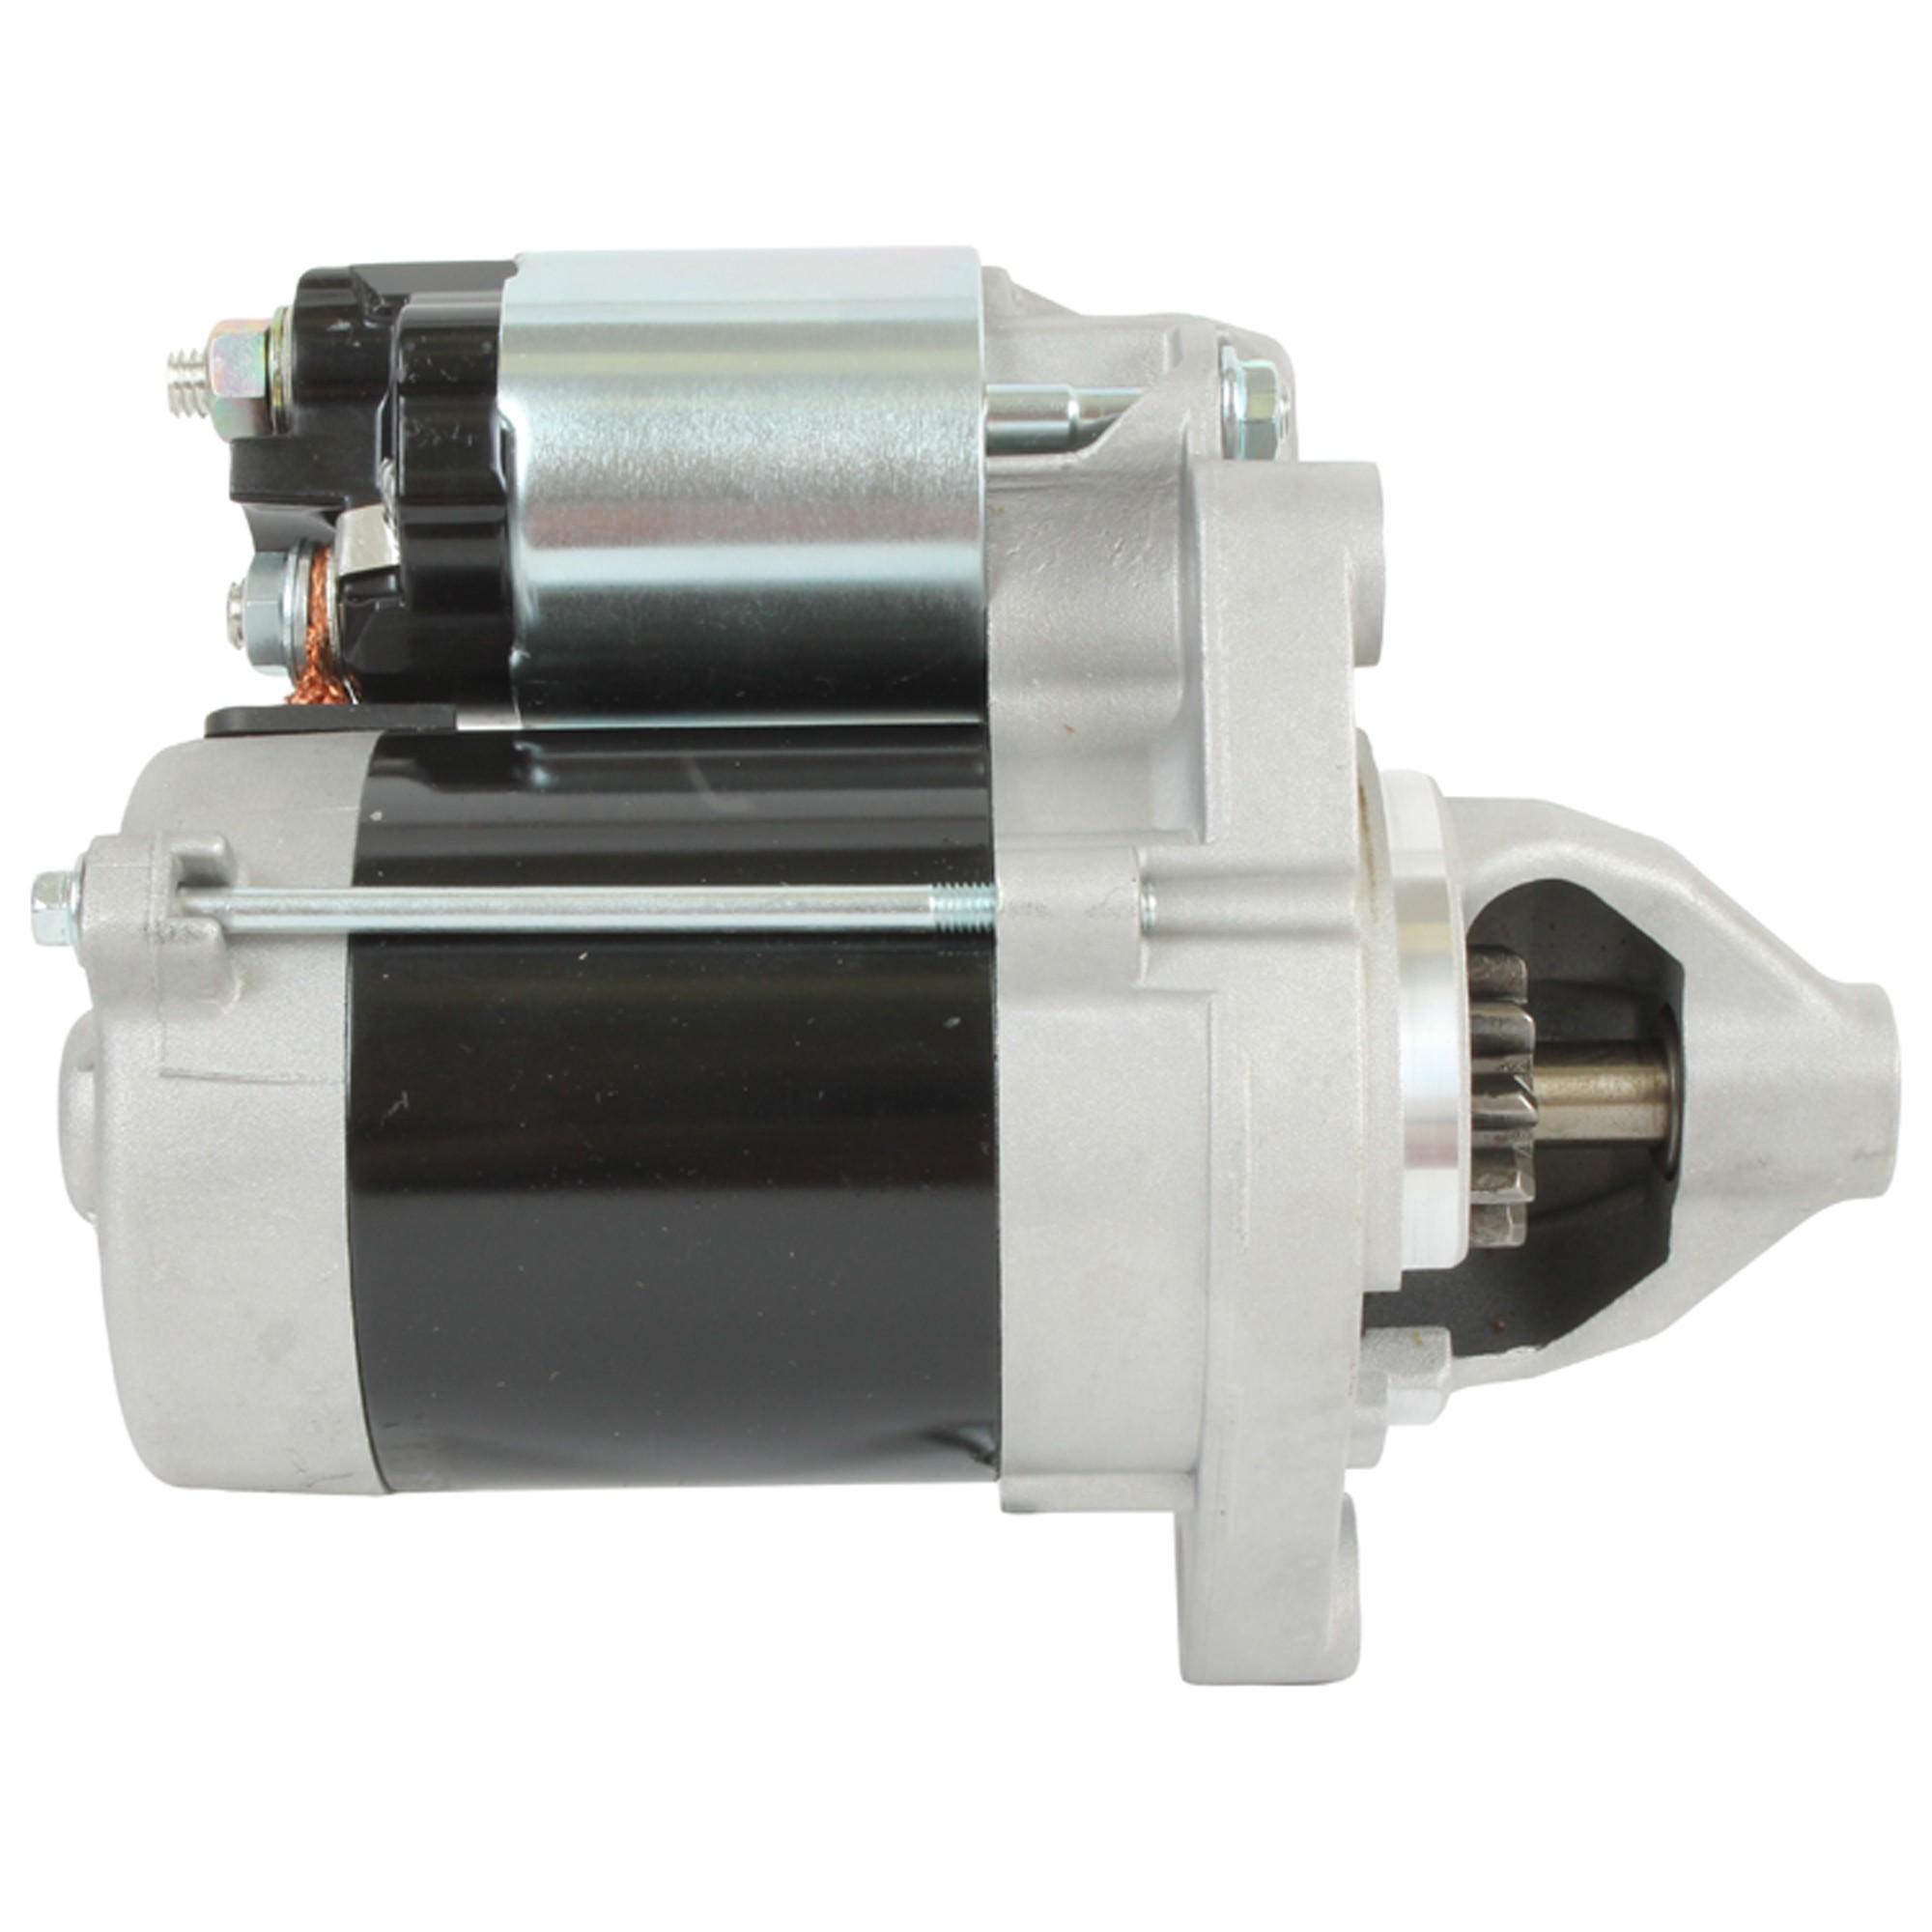 DV5E2 Denso 428000-6410 New 12 Volt Starter Replaces Honda 31200Z6L003